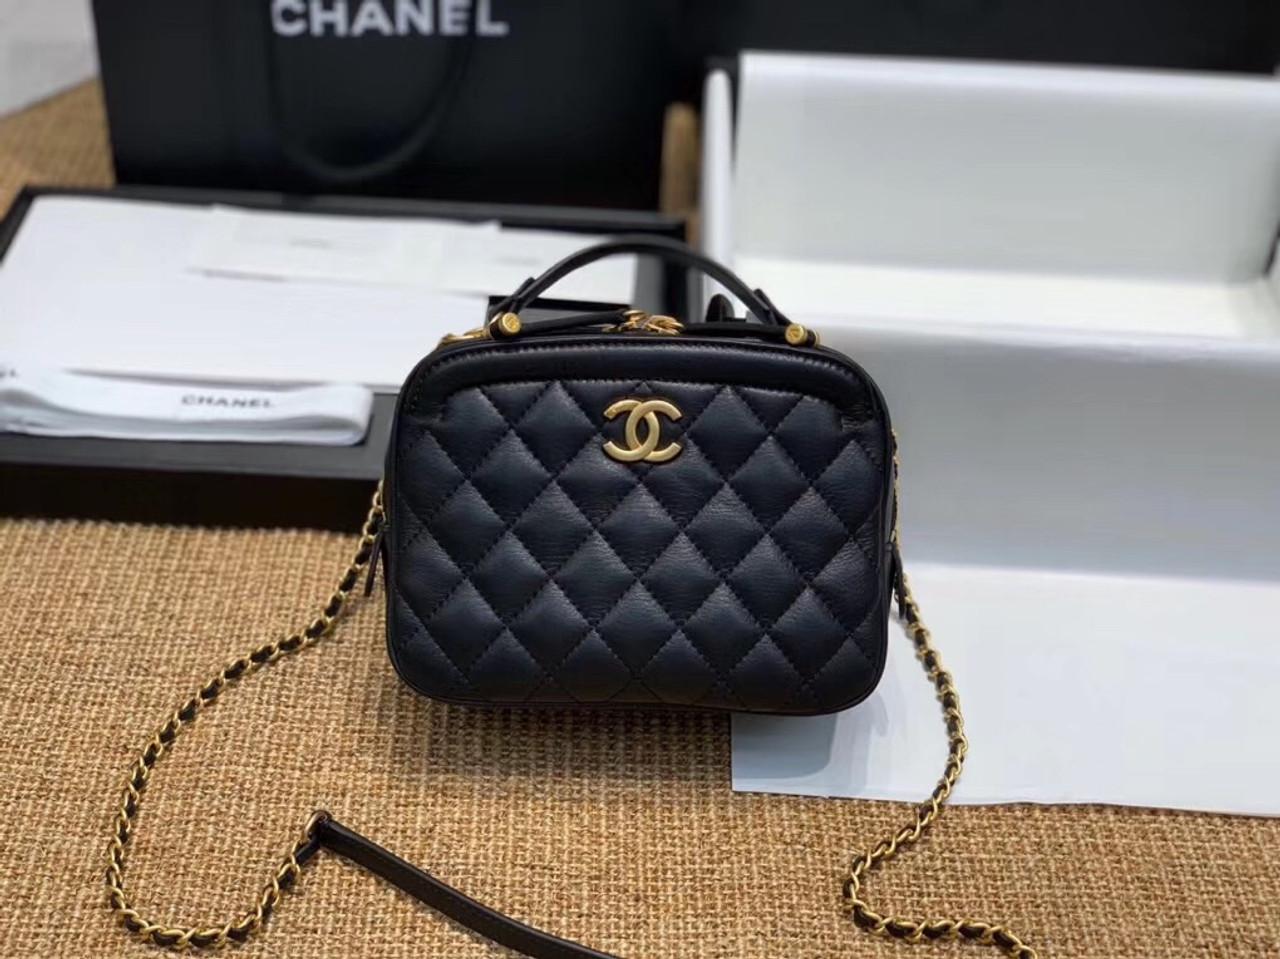 cf8cefa260cf8f Chanel Vanity Case Black A57950 - Bella Vita Moda